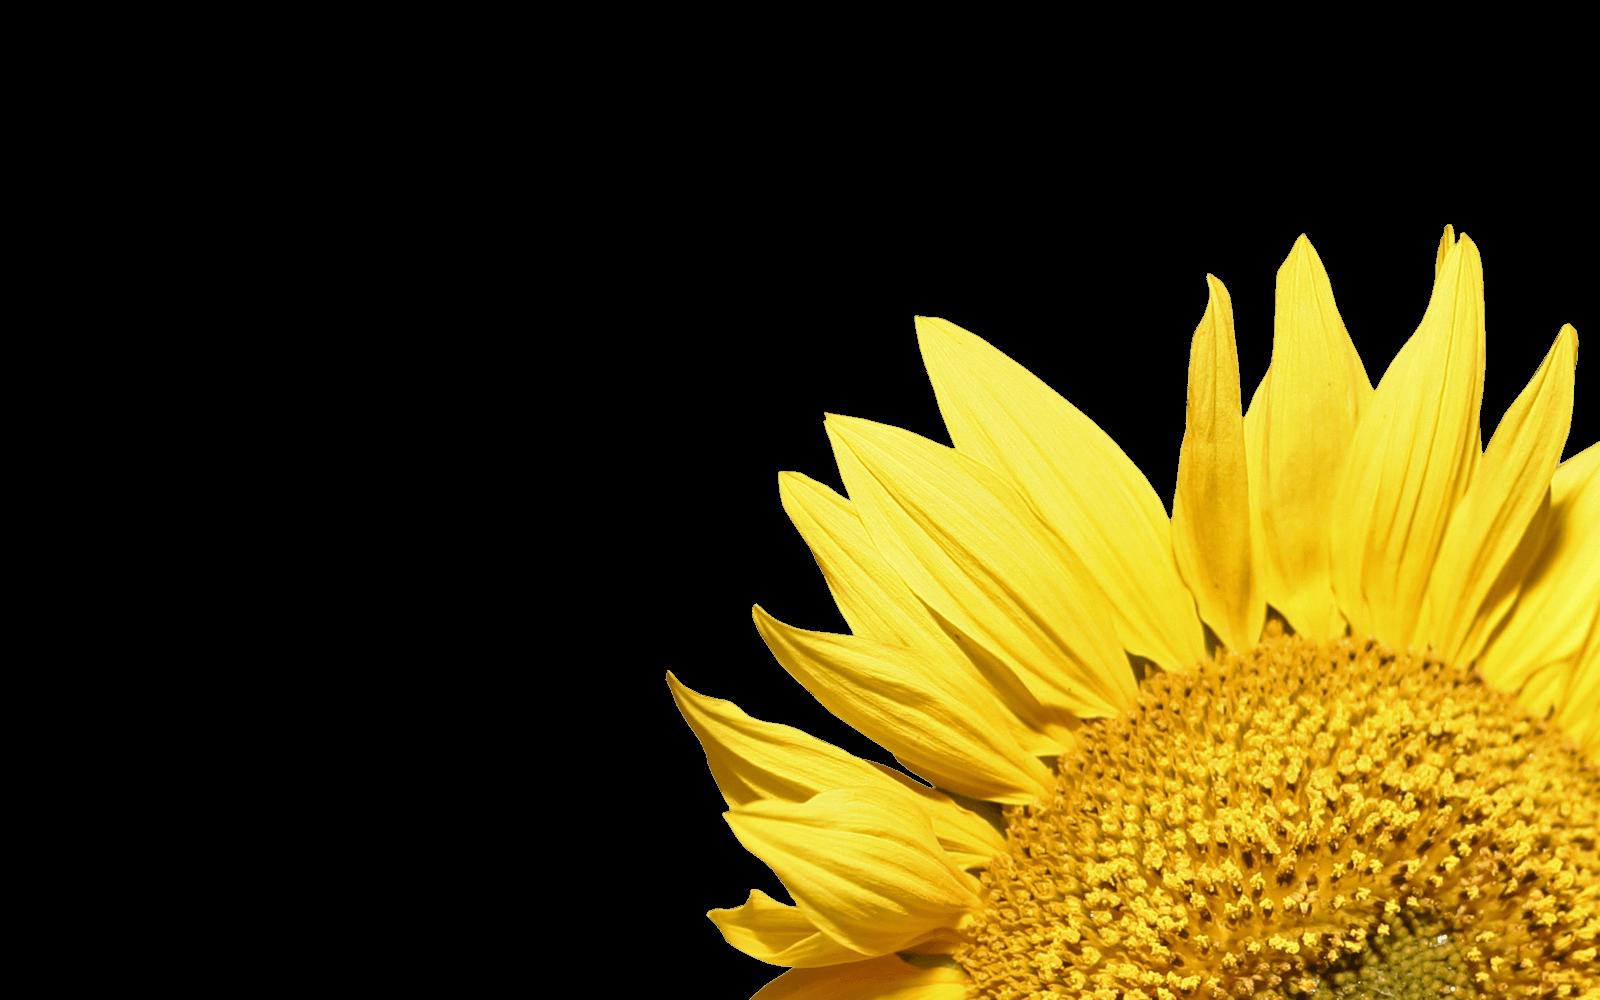 Daisies clipart corner. Sunflower transparent png stickpng